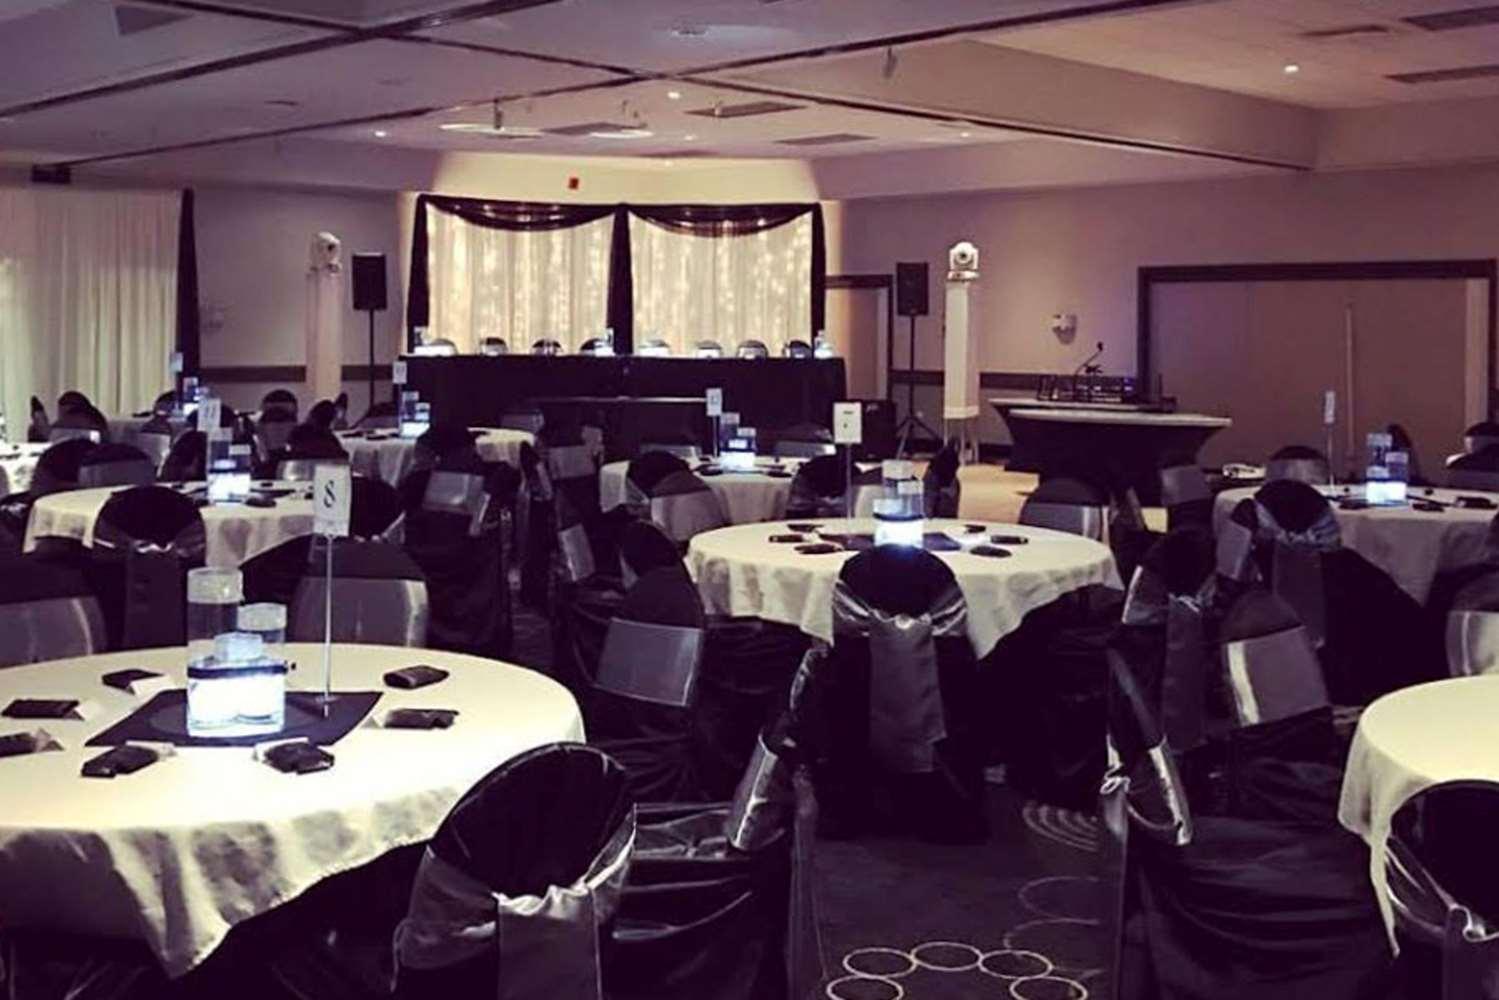 Meeting Facilities - Clarion Hotel & Suites Brandon